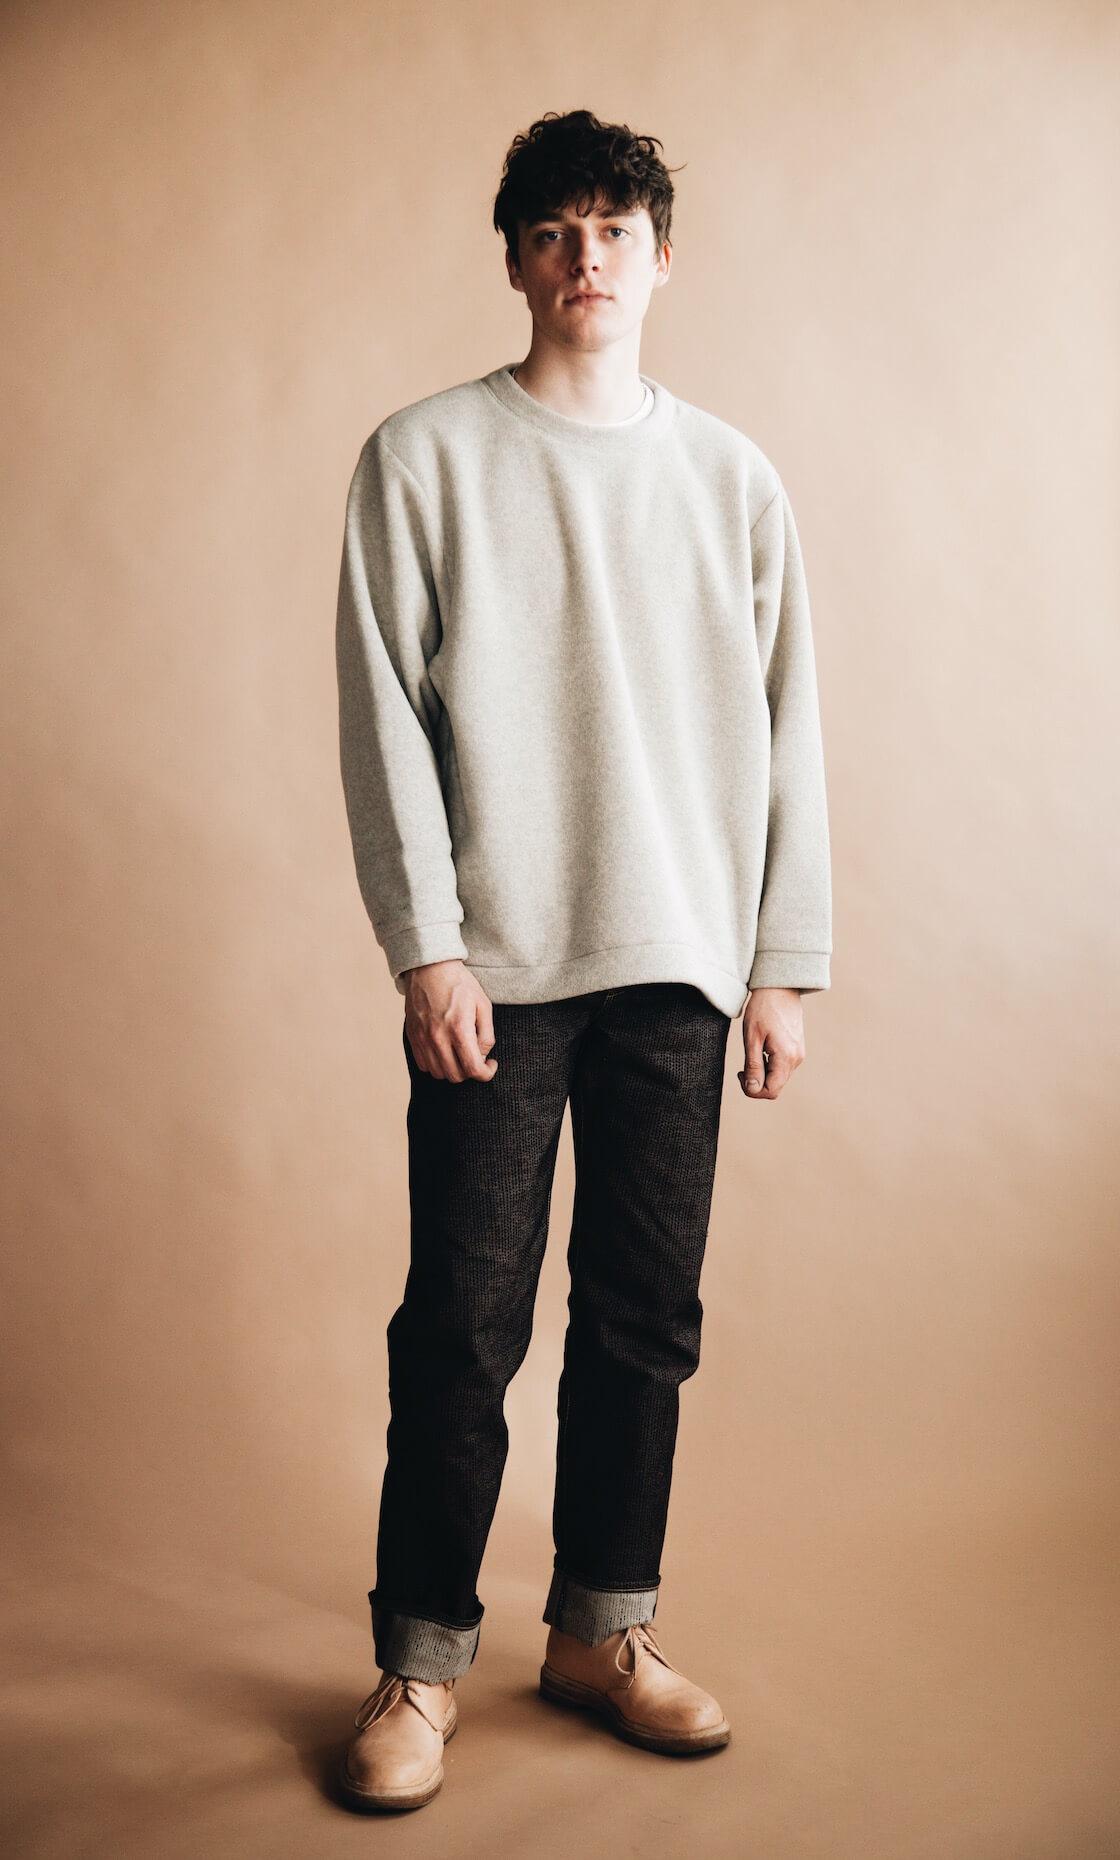 kapital reverse fleece big crew sweatshirt, century denim pants, and hender scheme mip 21 shoes on body